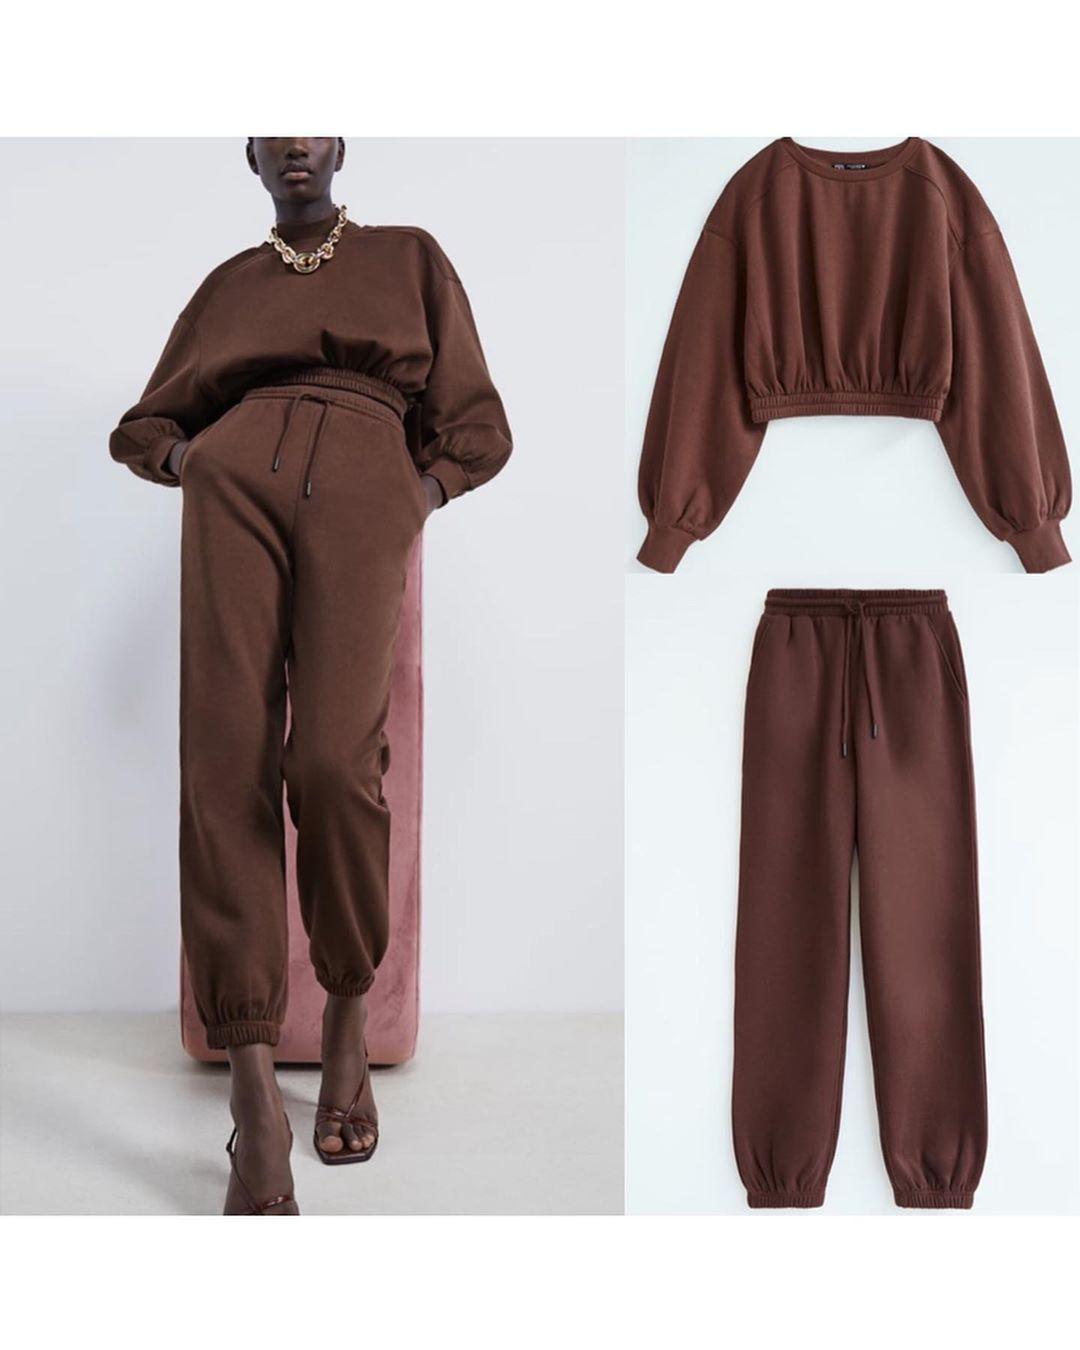 pantalon de jogging limitless contour collection 09 de Zara sur look_by_zara_hm